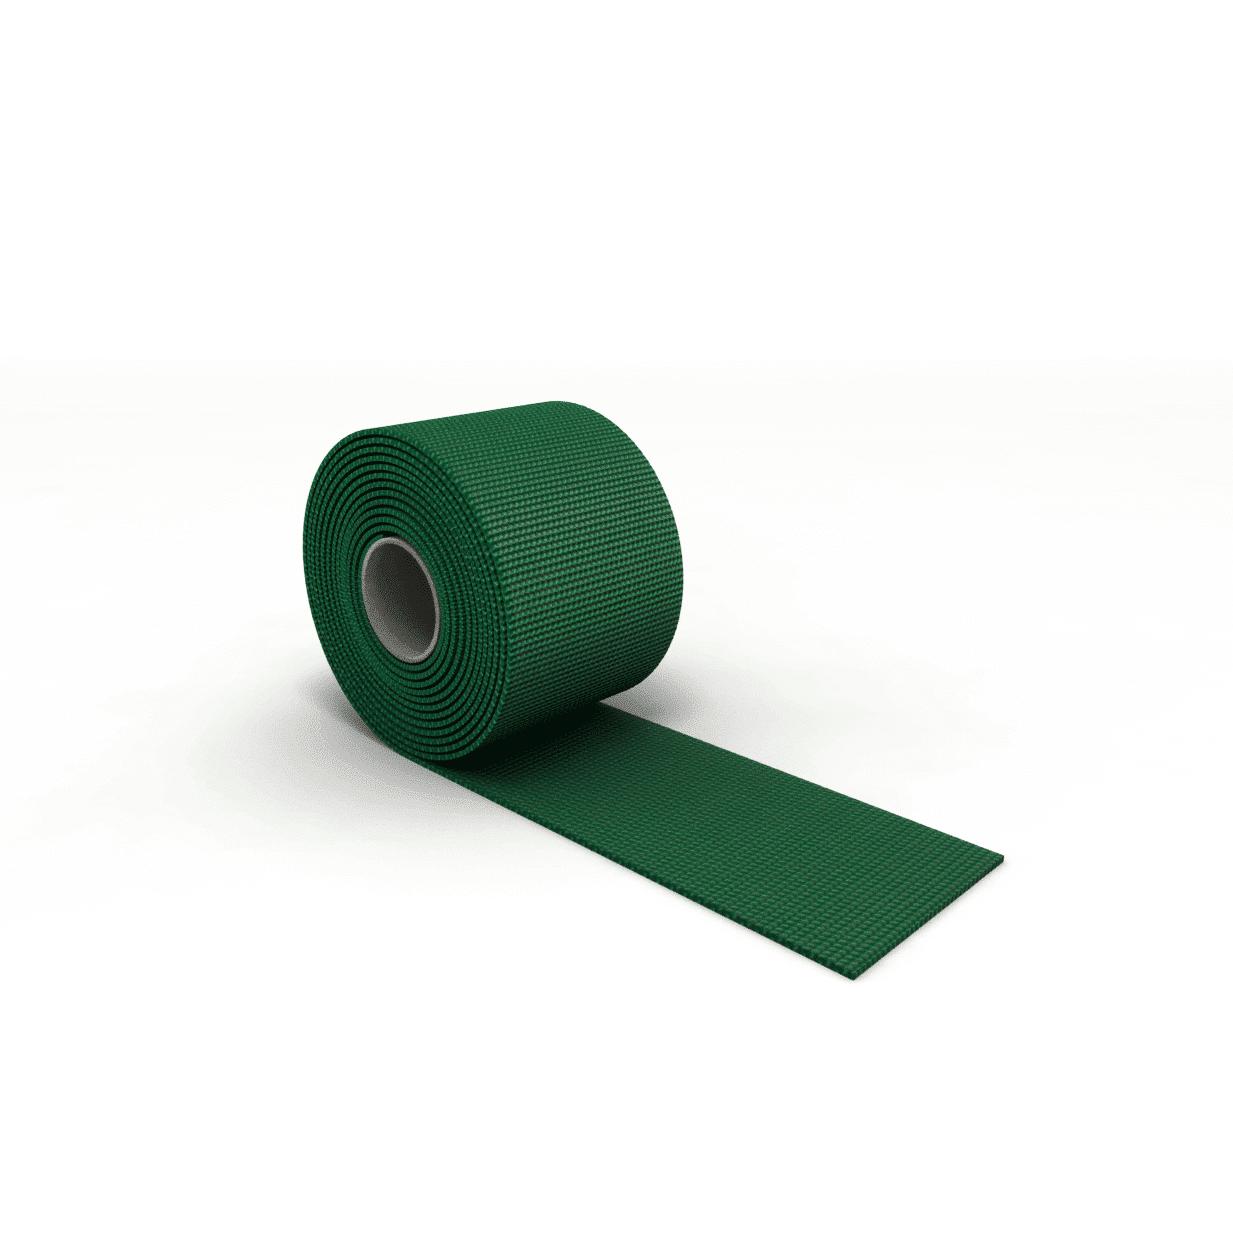 Gurtband für Rodelsitz dunkelgrün